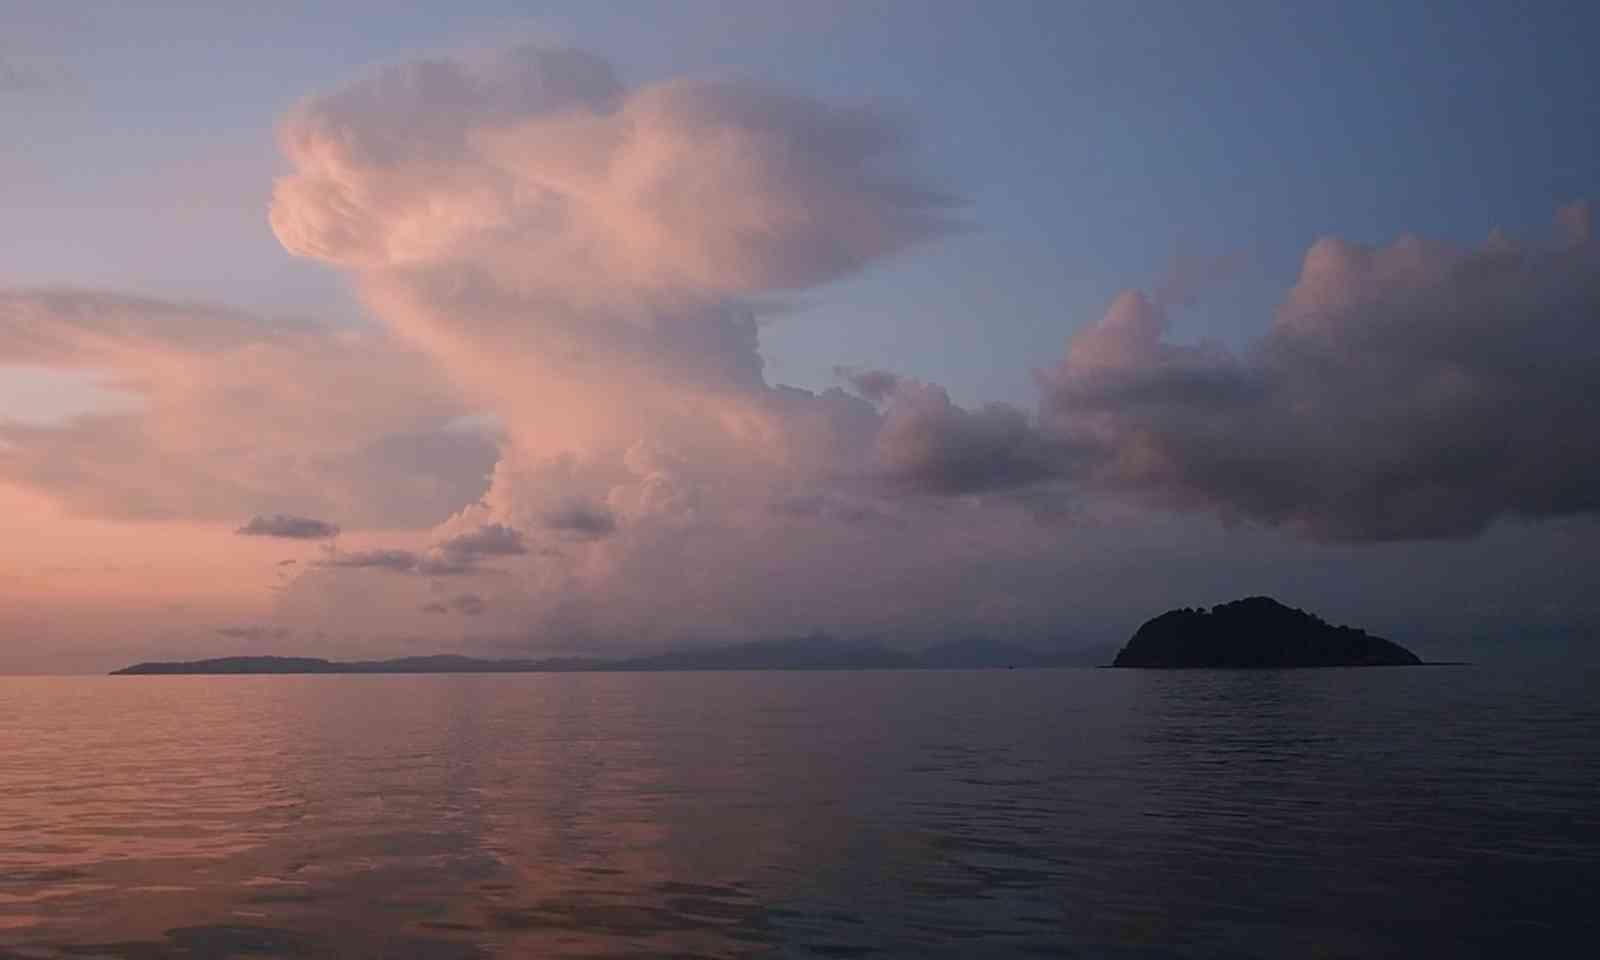 Bullion islands (Liz Cleere)